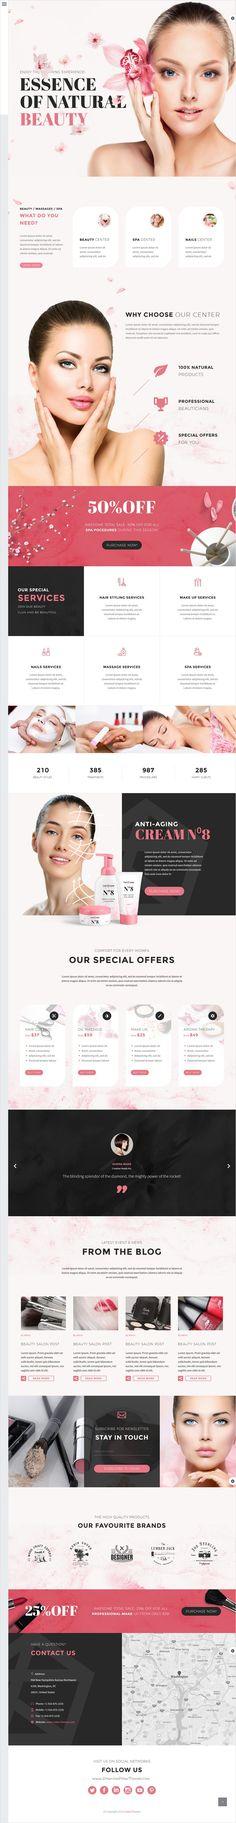 TheGem is a versatile #WordPress theme with modern creative design for #spa #beauty #salon website with 40+ stunning homepage layouts download now➩ https://themeforest.net/item/thegem-creative-multipurpose-wordpress-theme/16061685?ref=Datasata